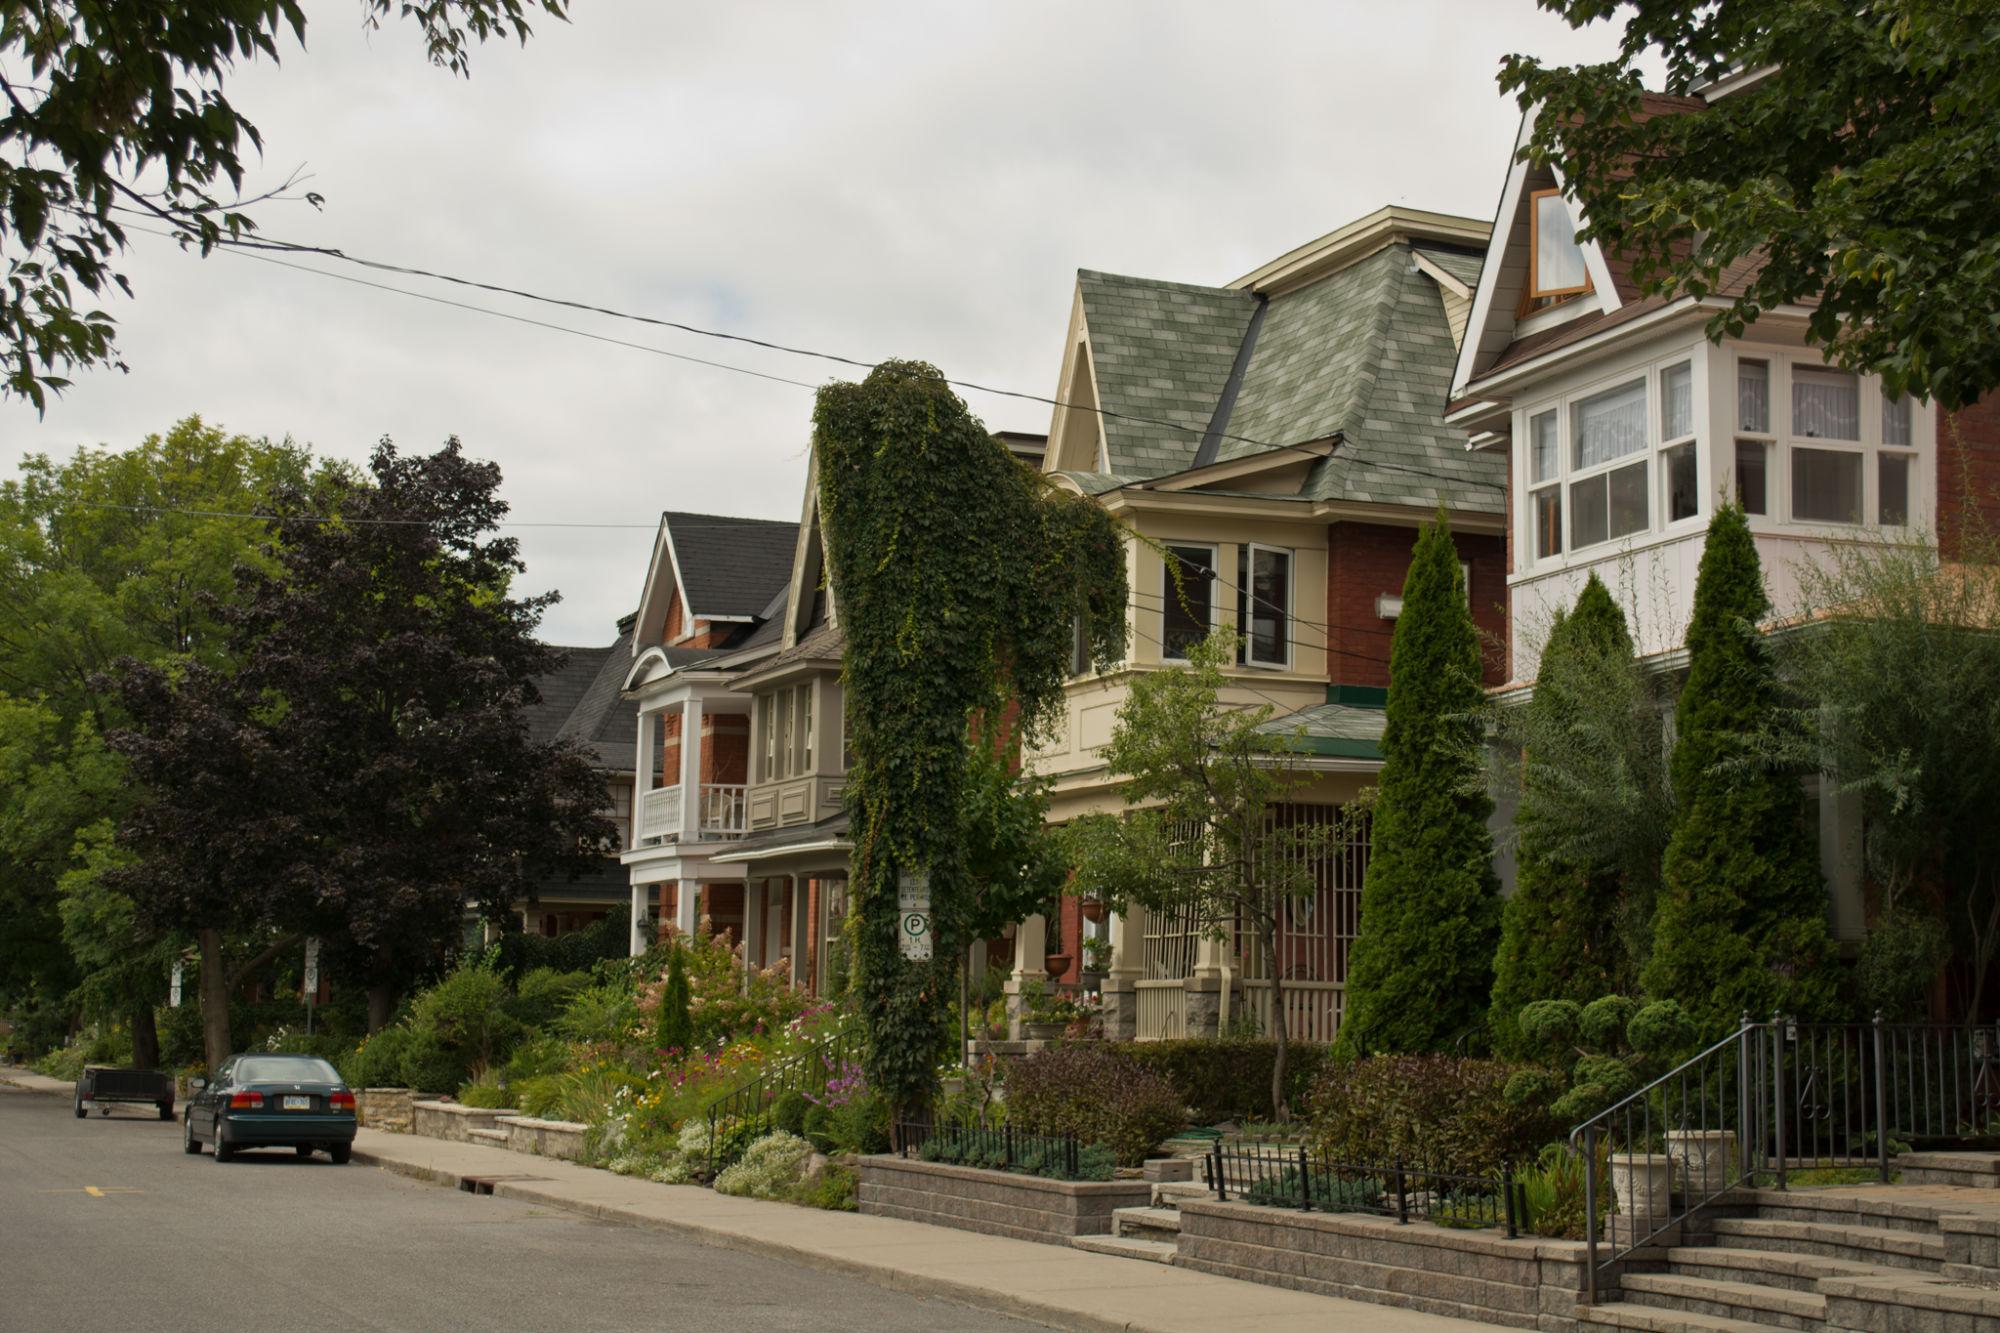 My neighborhood in Ottawa -- so cozy and quiet!